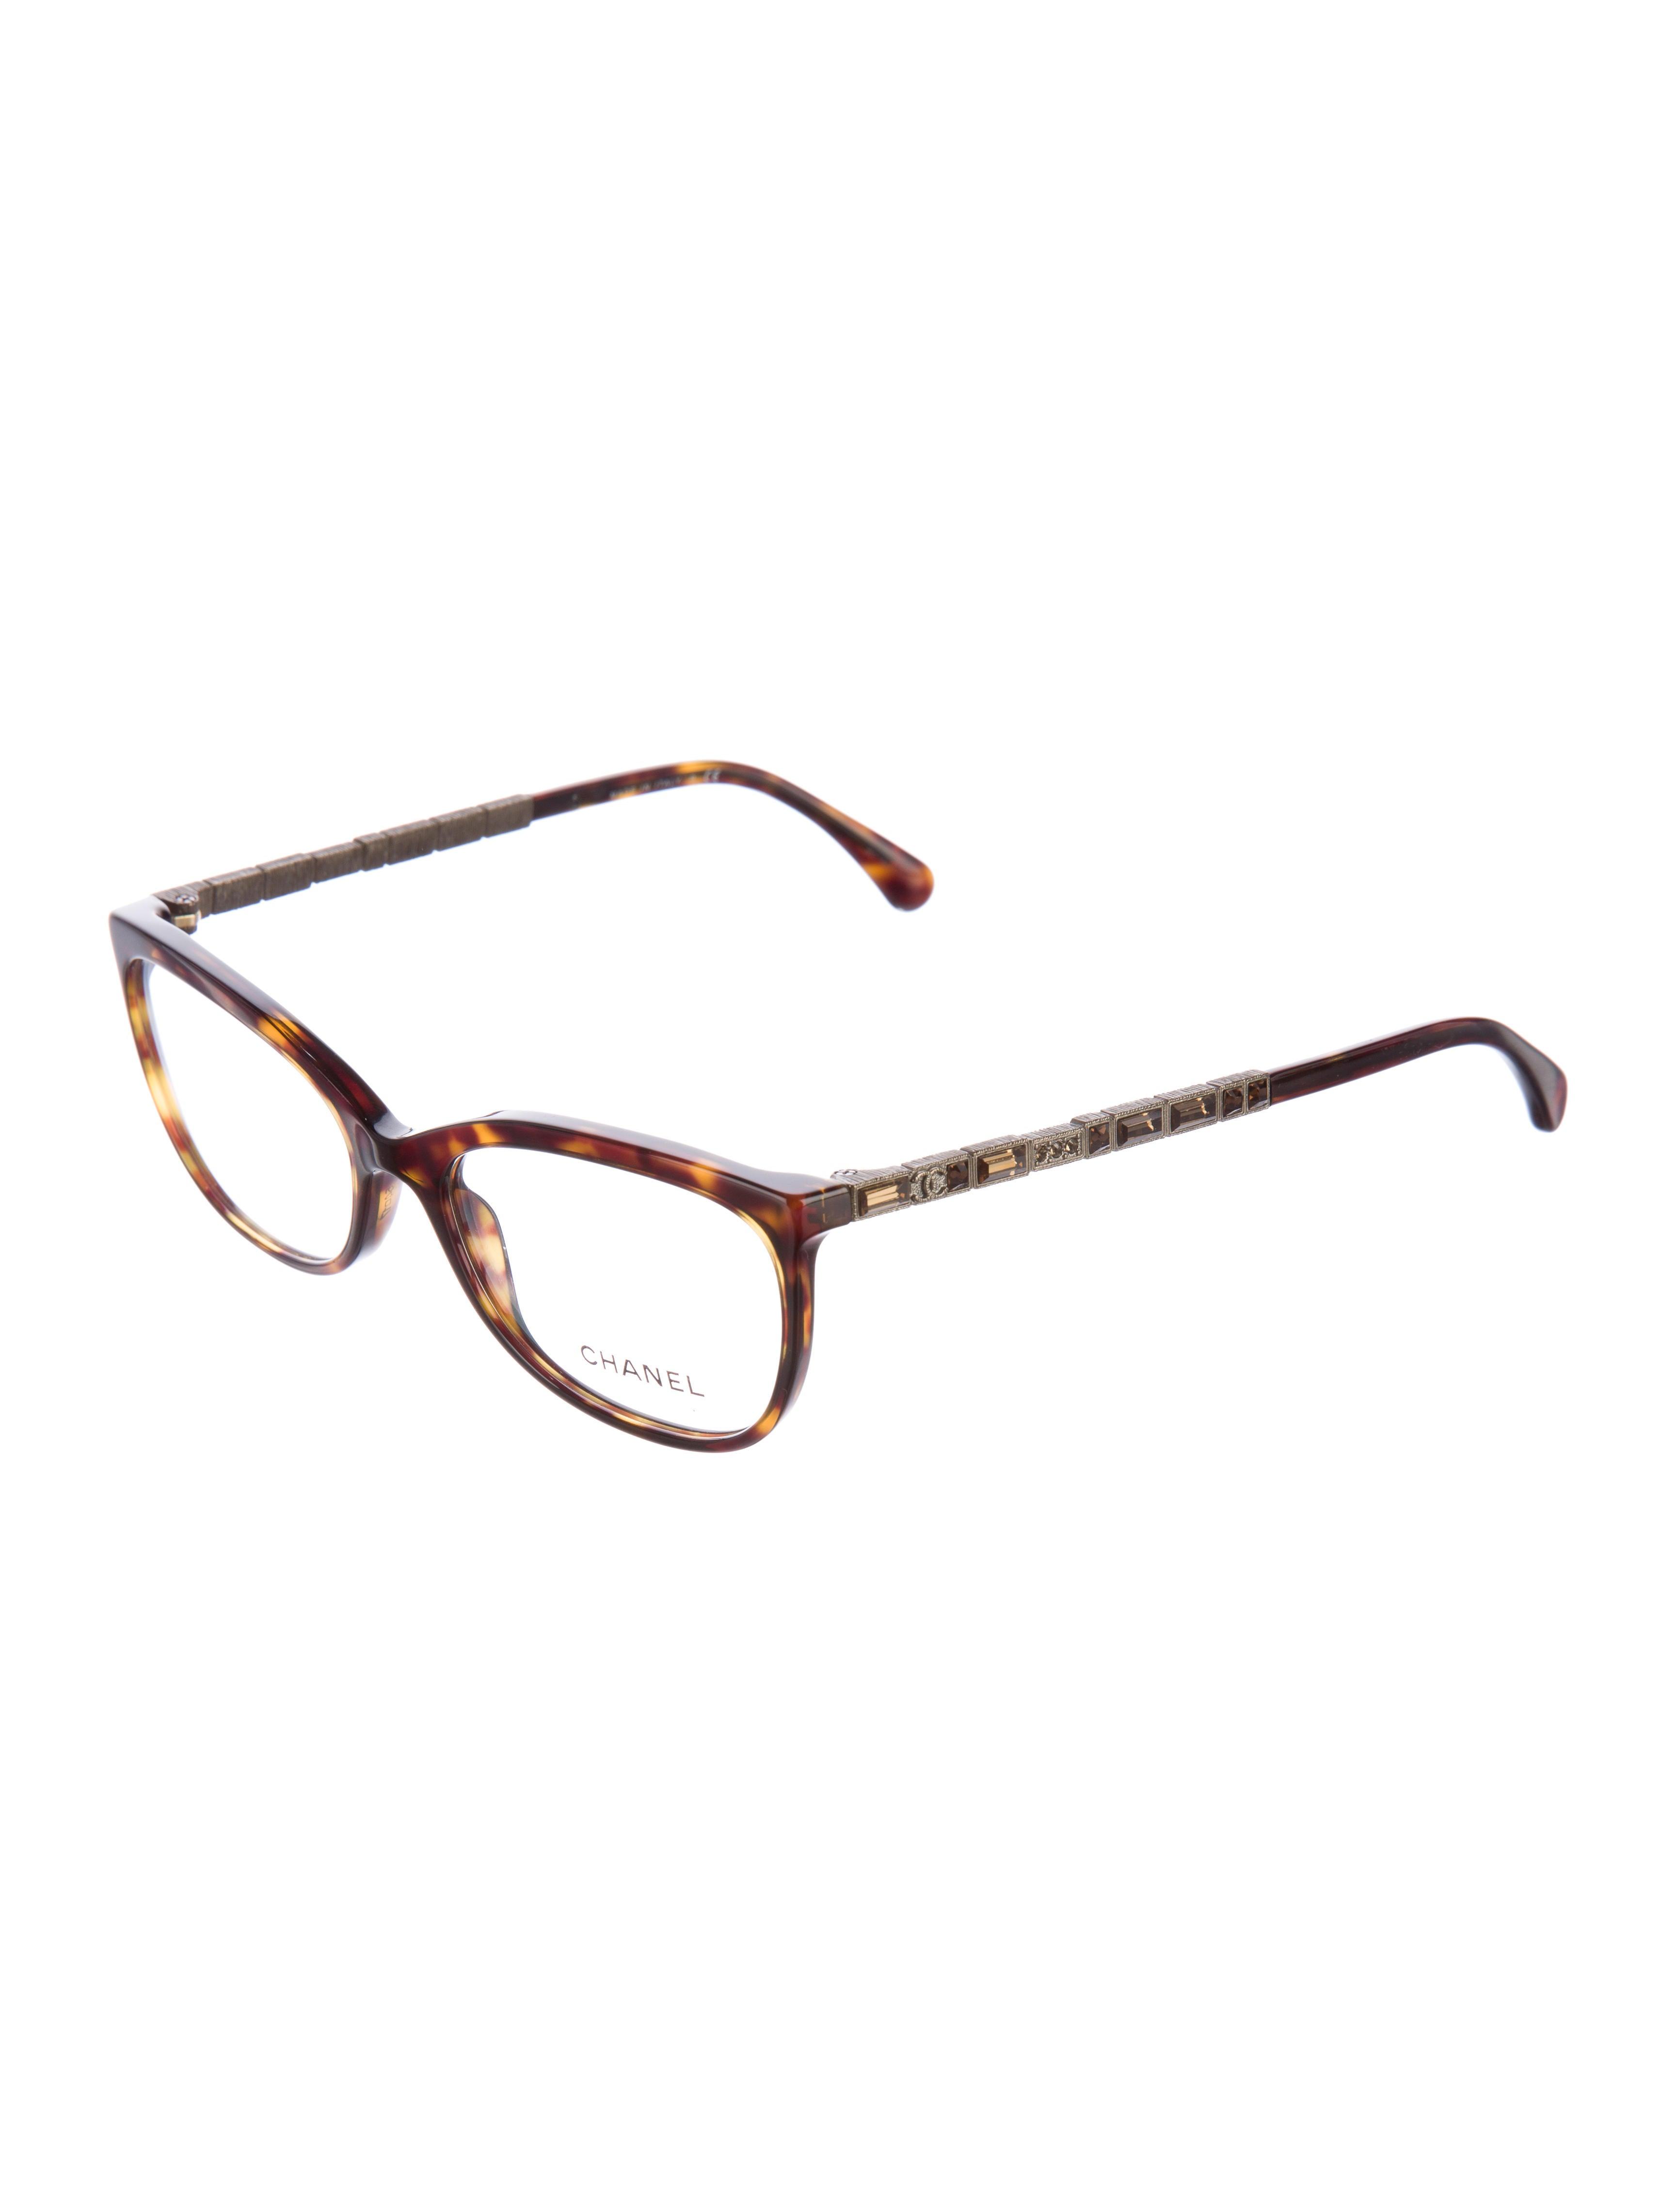 chanel embellished cat eye eyeglasses accessories